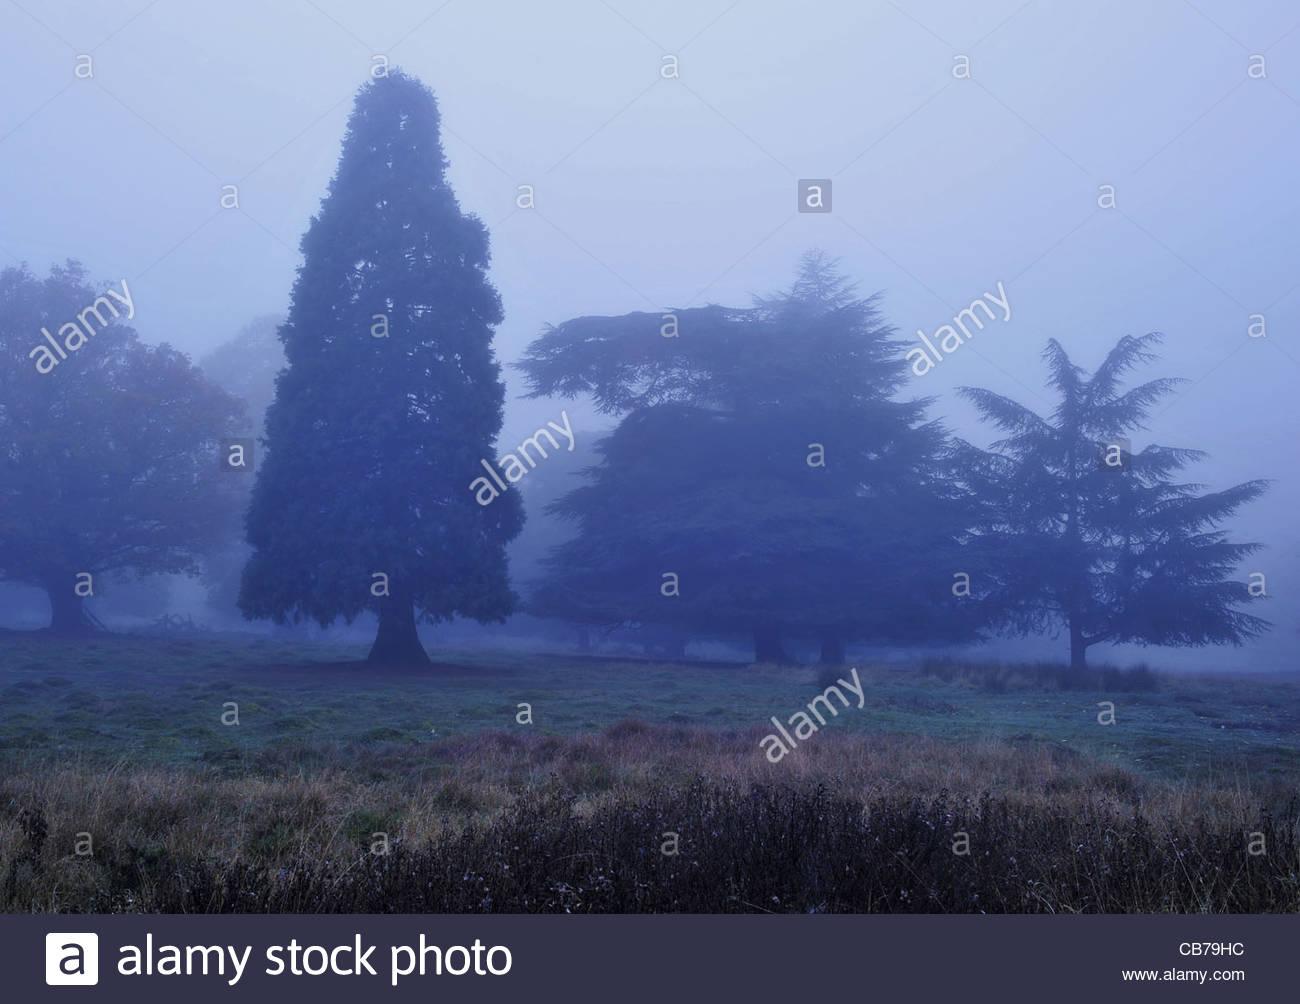 Trees in morning fog, Richmond Park London UK - Stock Image